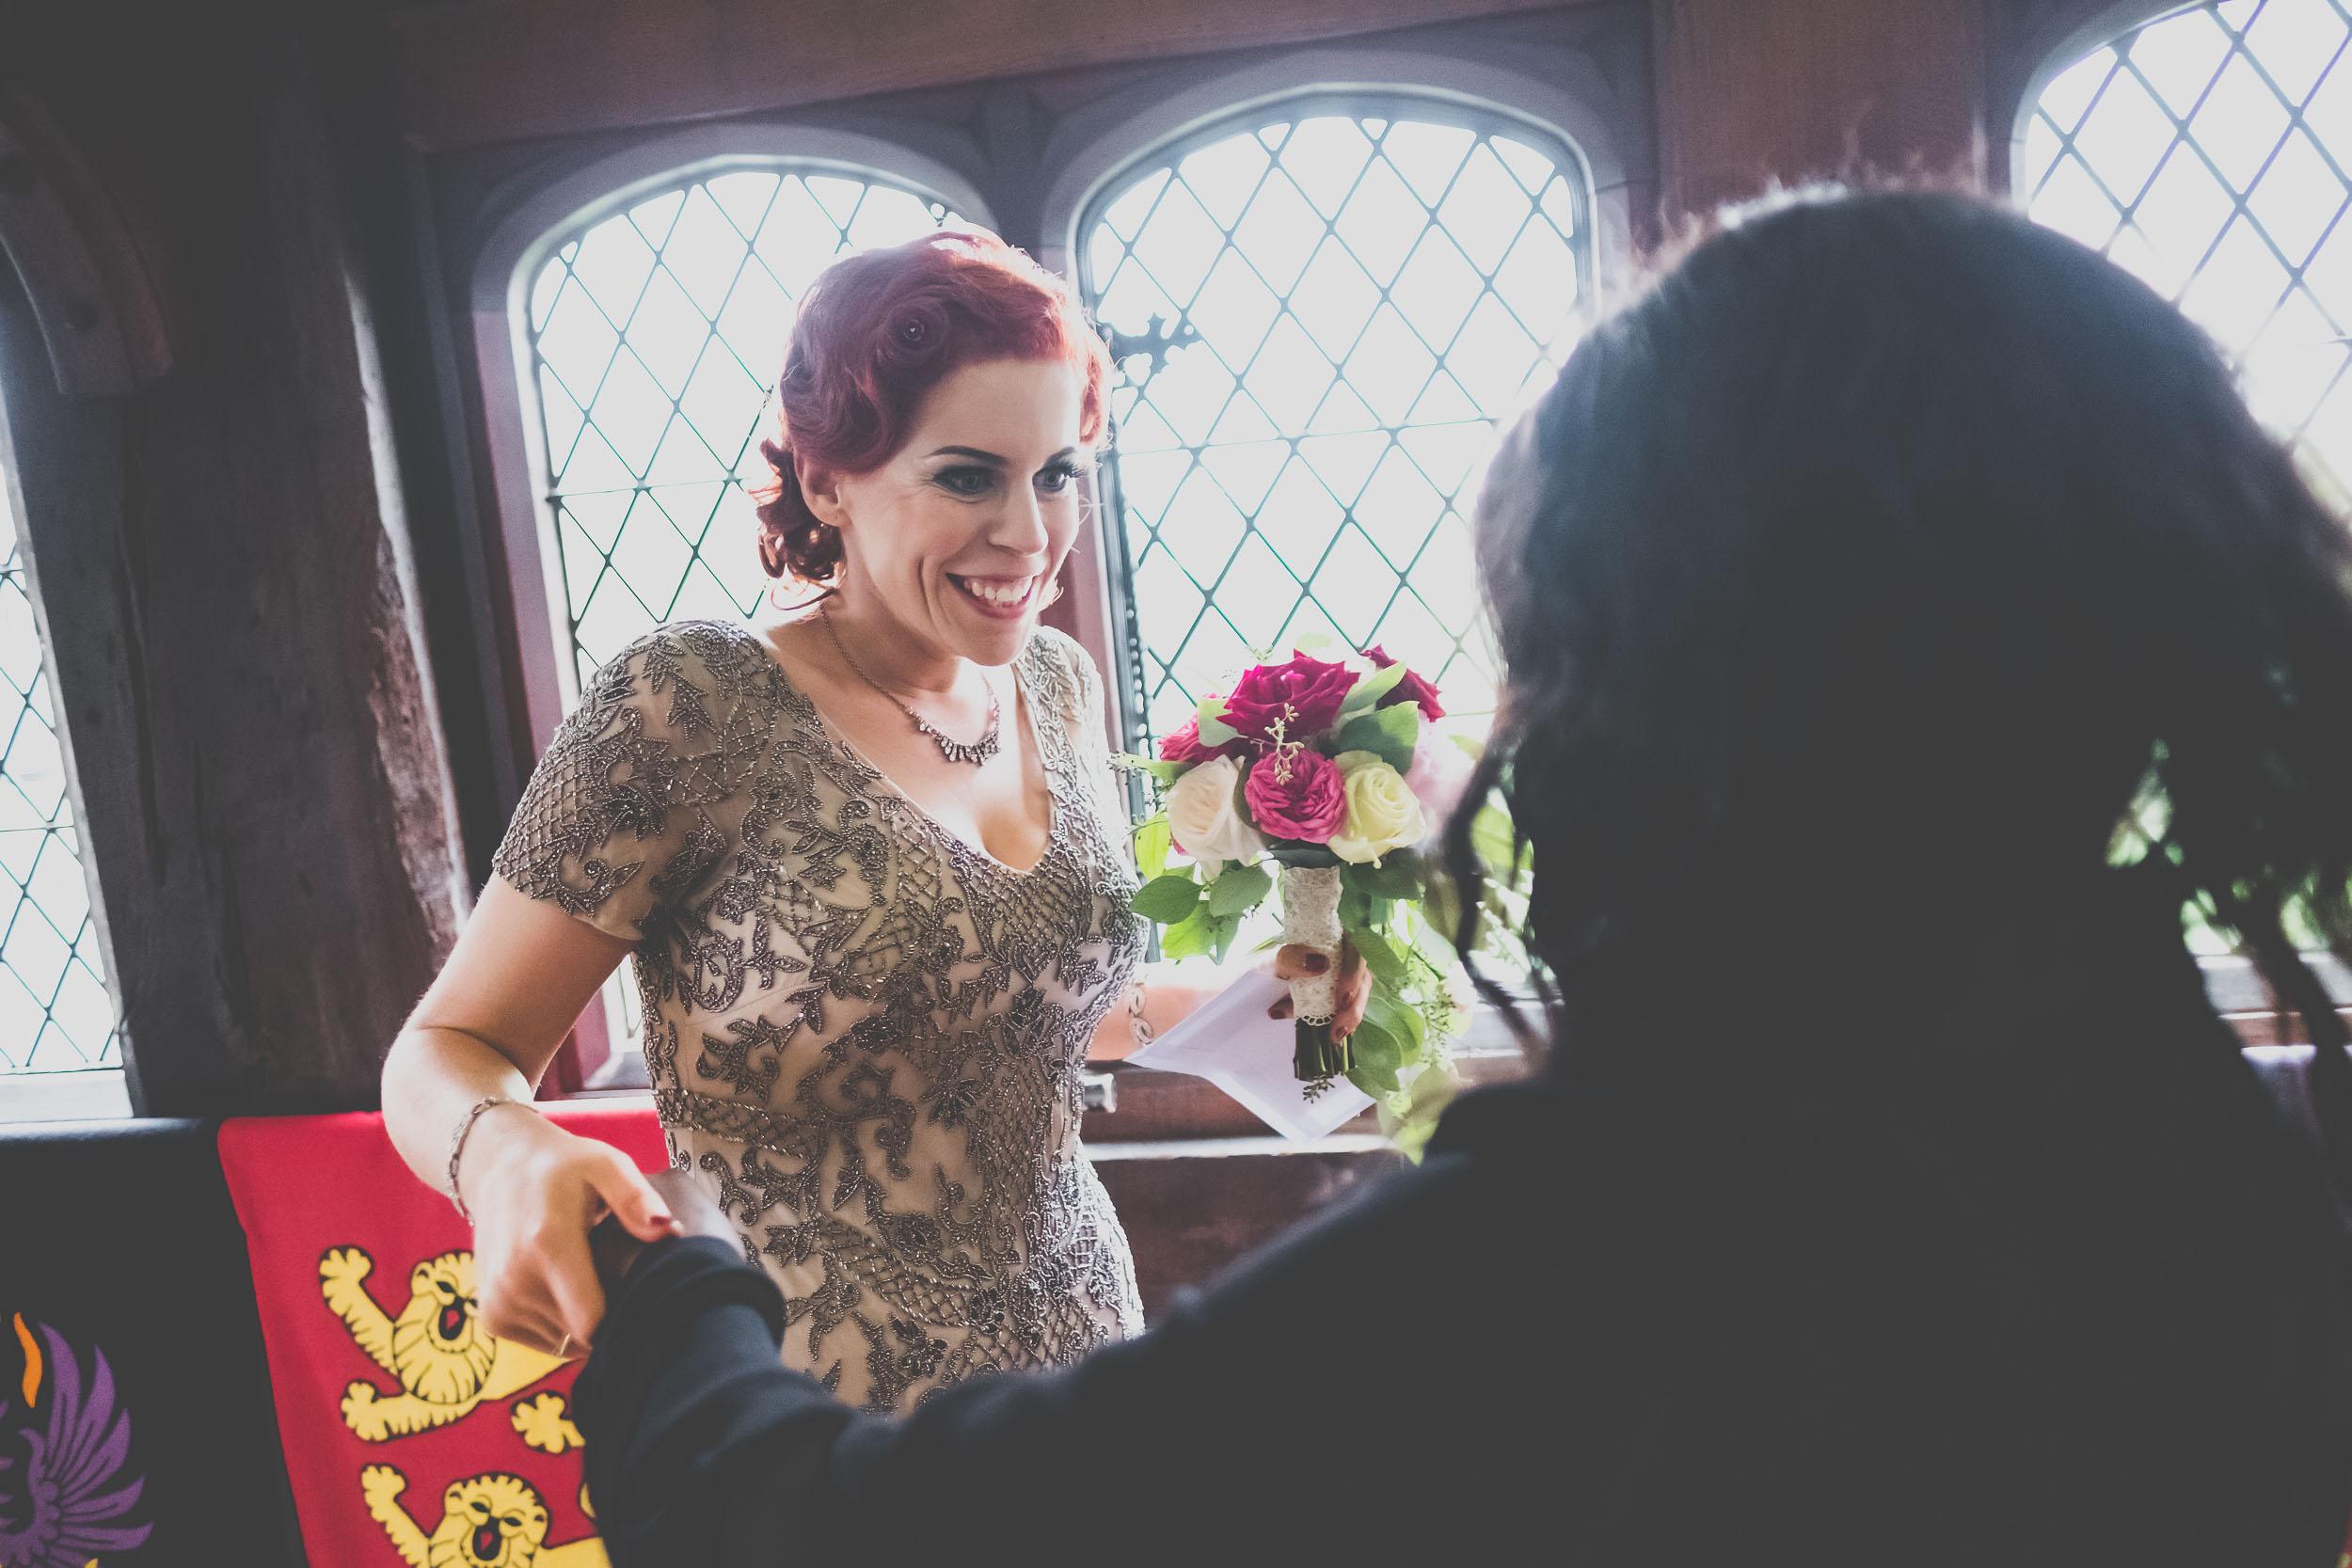 queen-elizabeths-hunting-lodge-epping-forest-wedding135.jpg